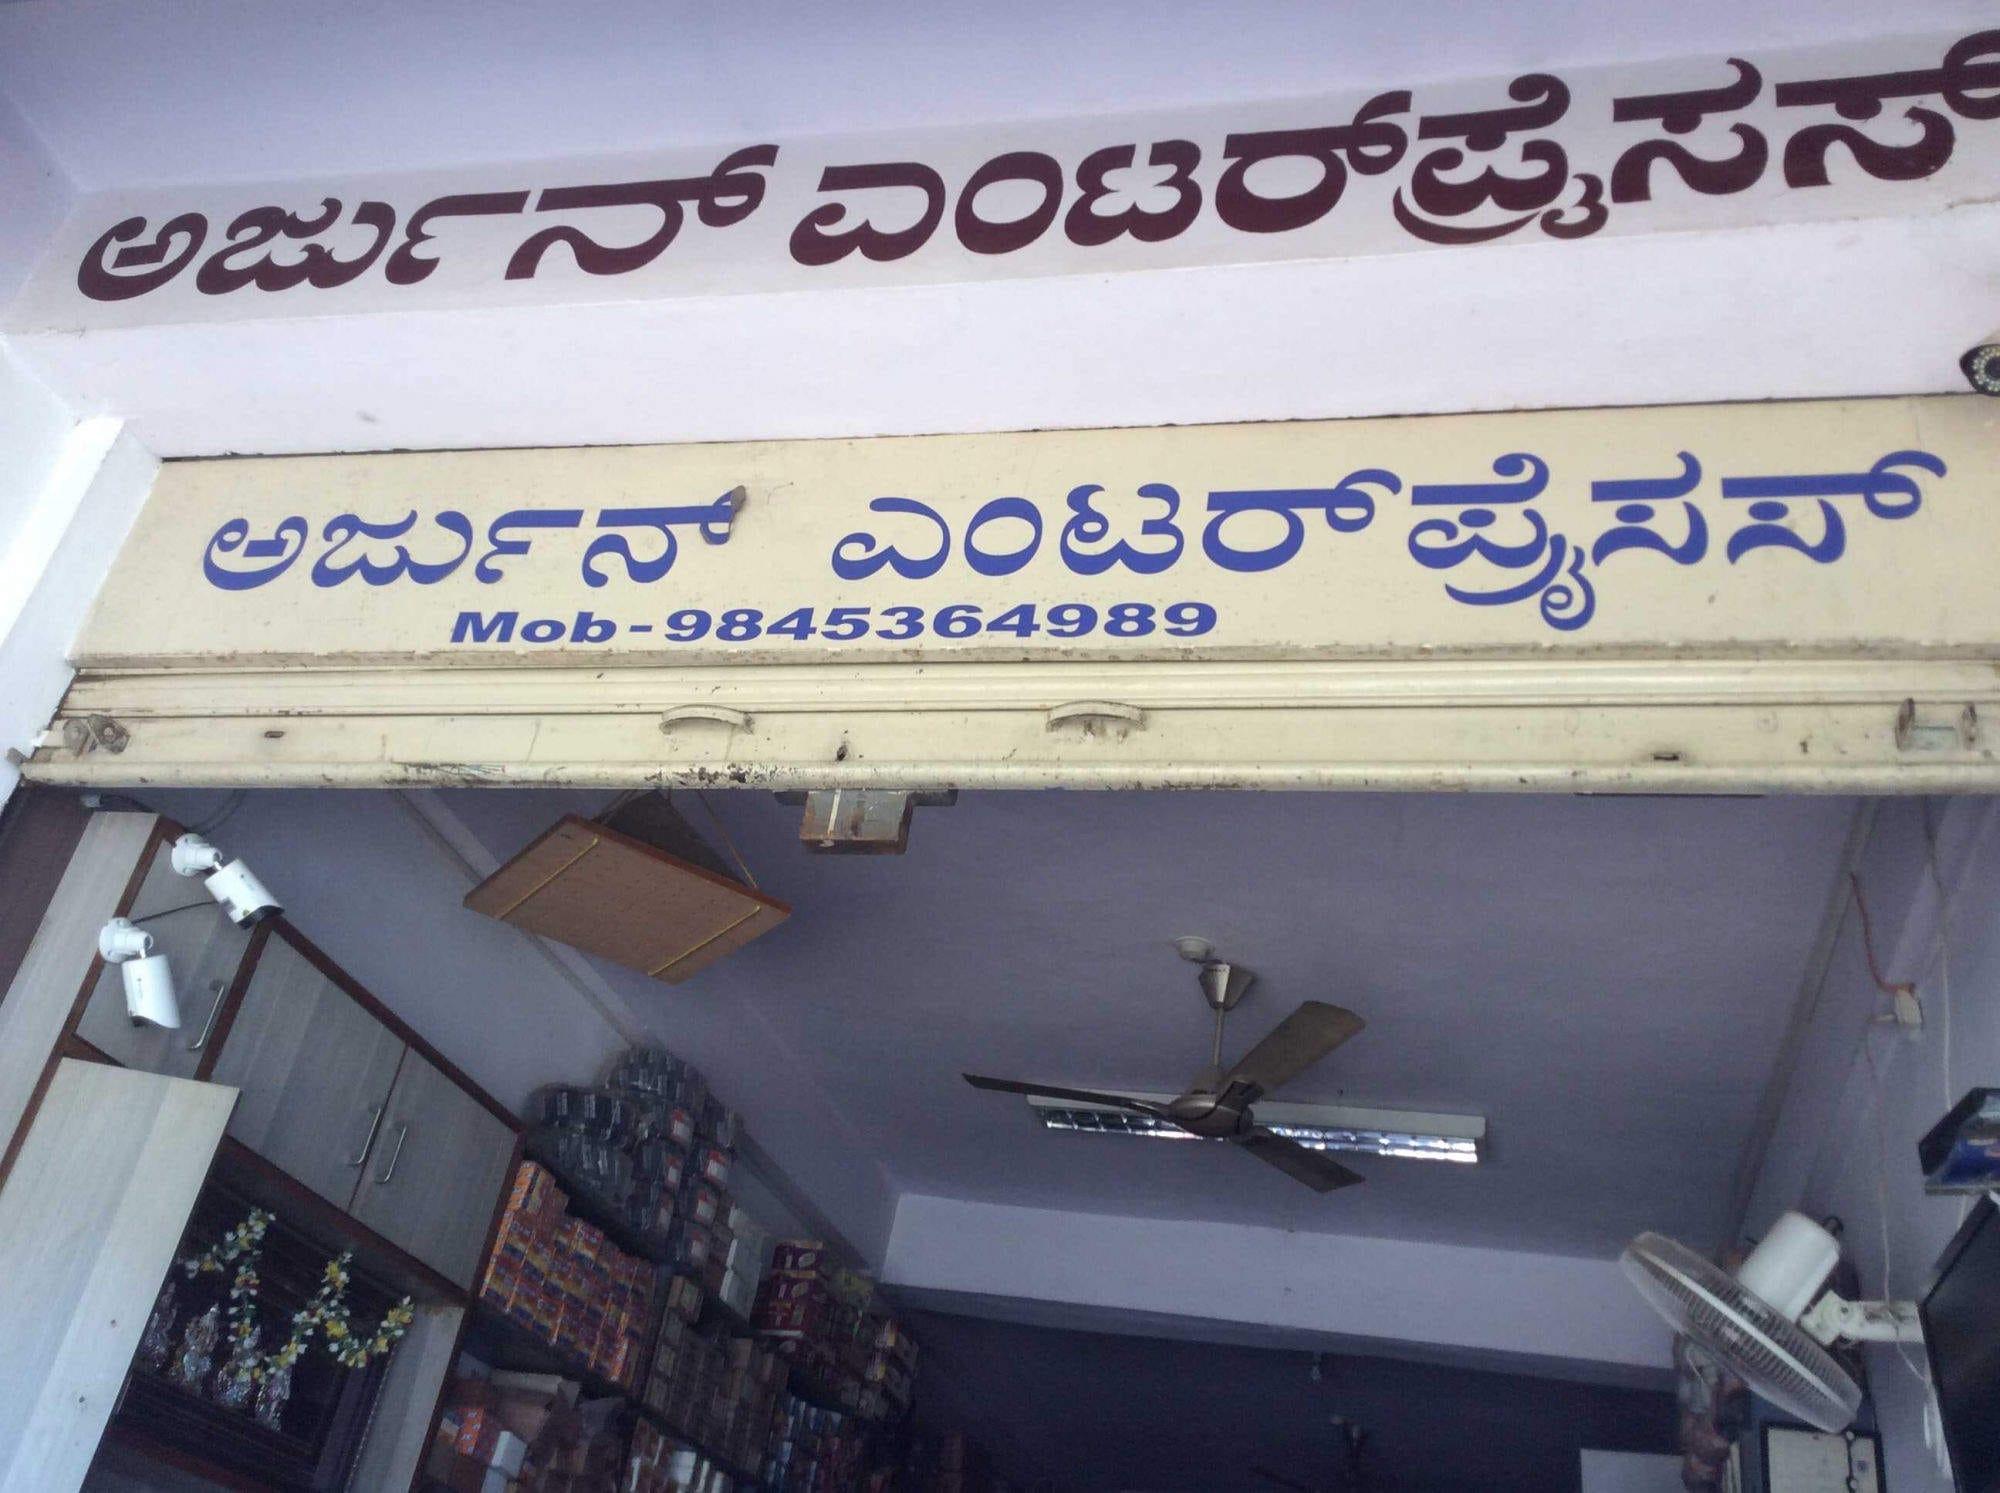 Unnati pumps dealers in bangalore dating